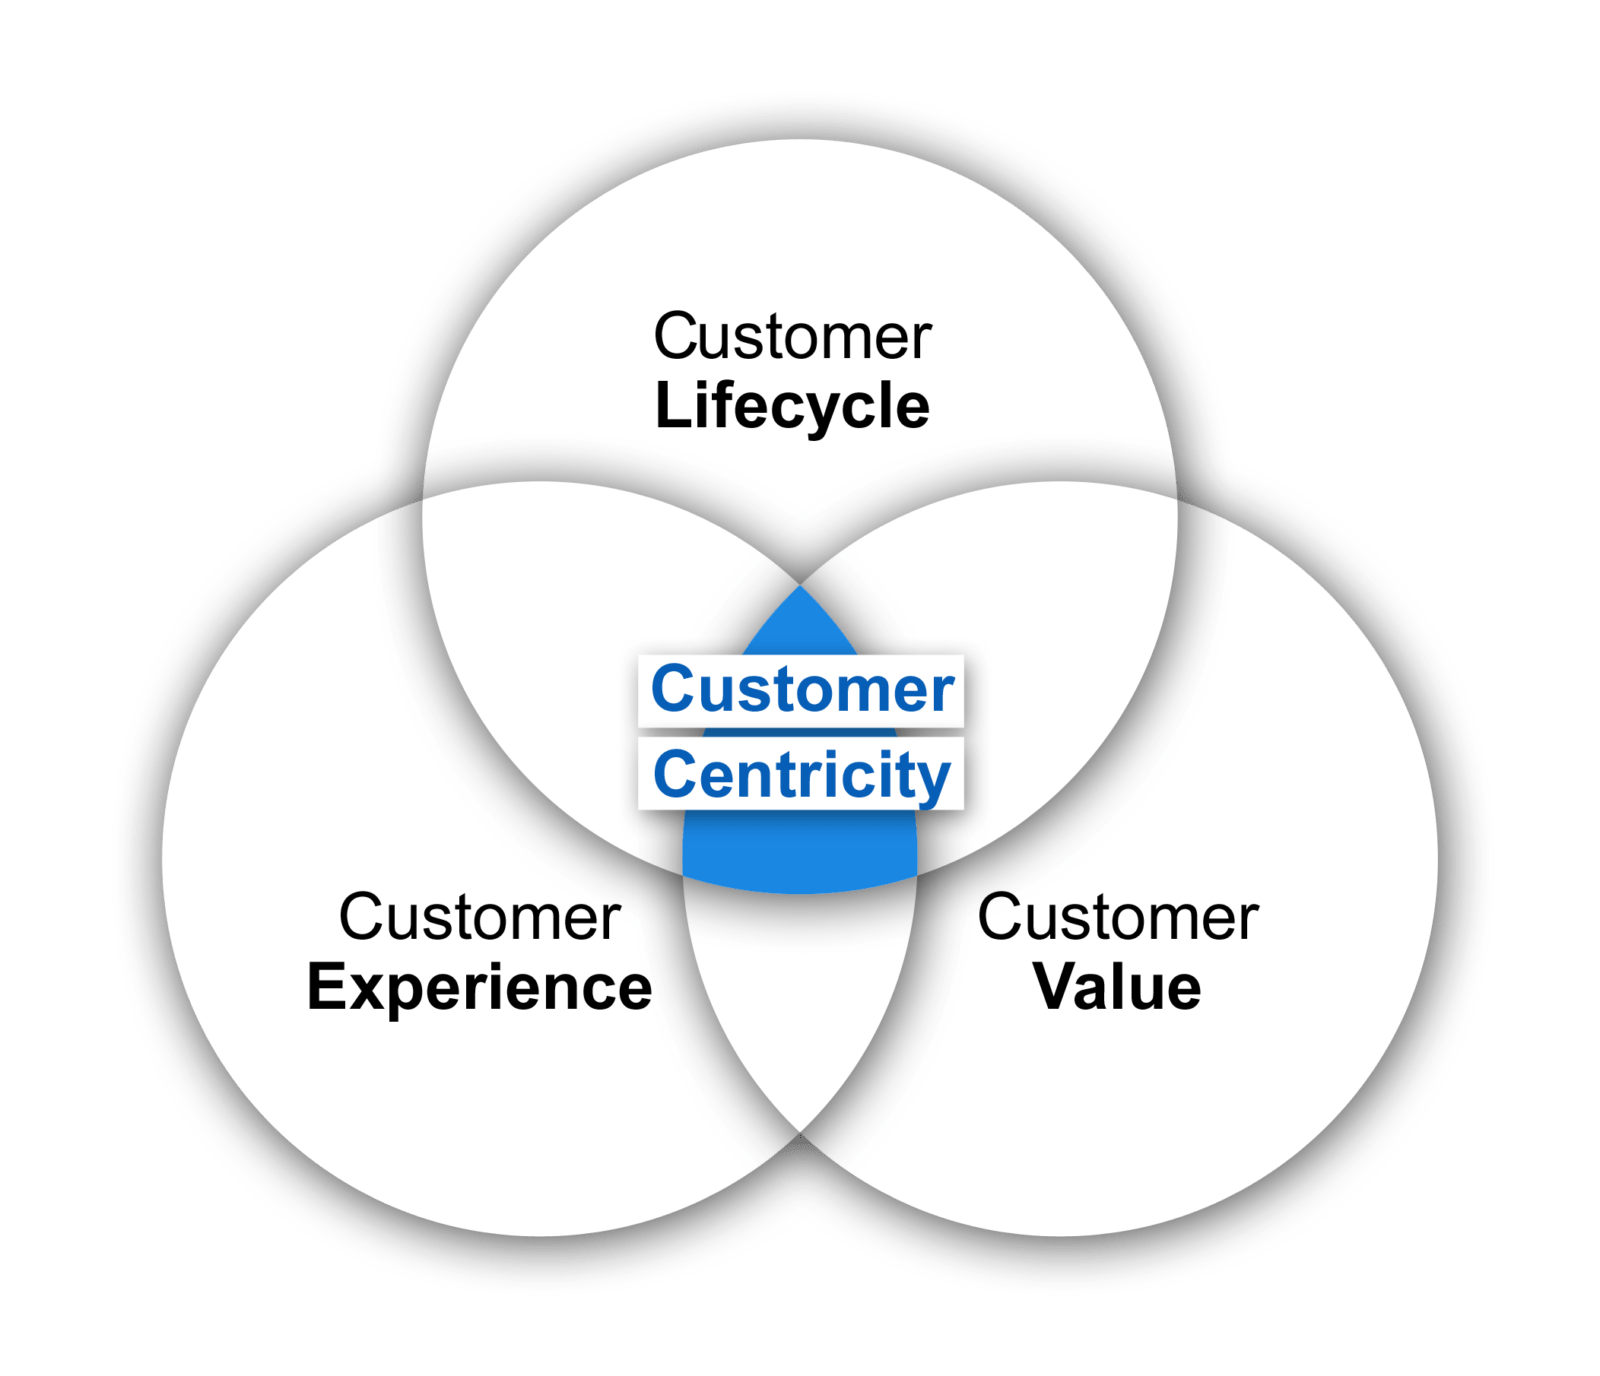 Customer Centricity model